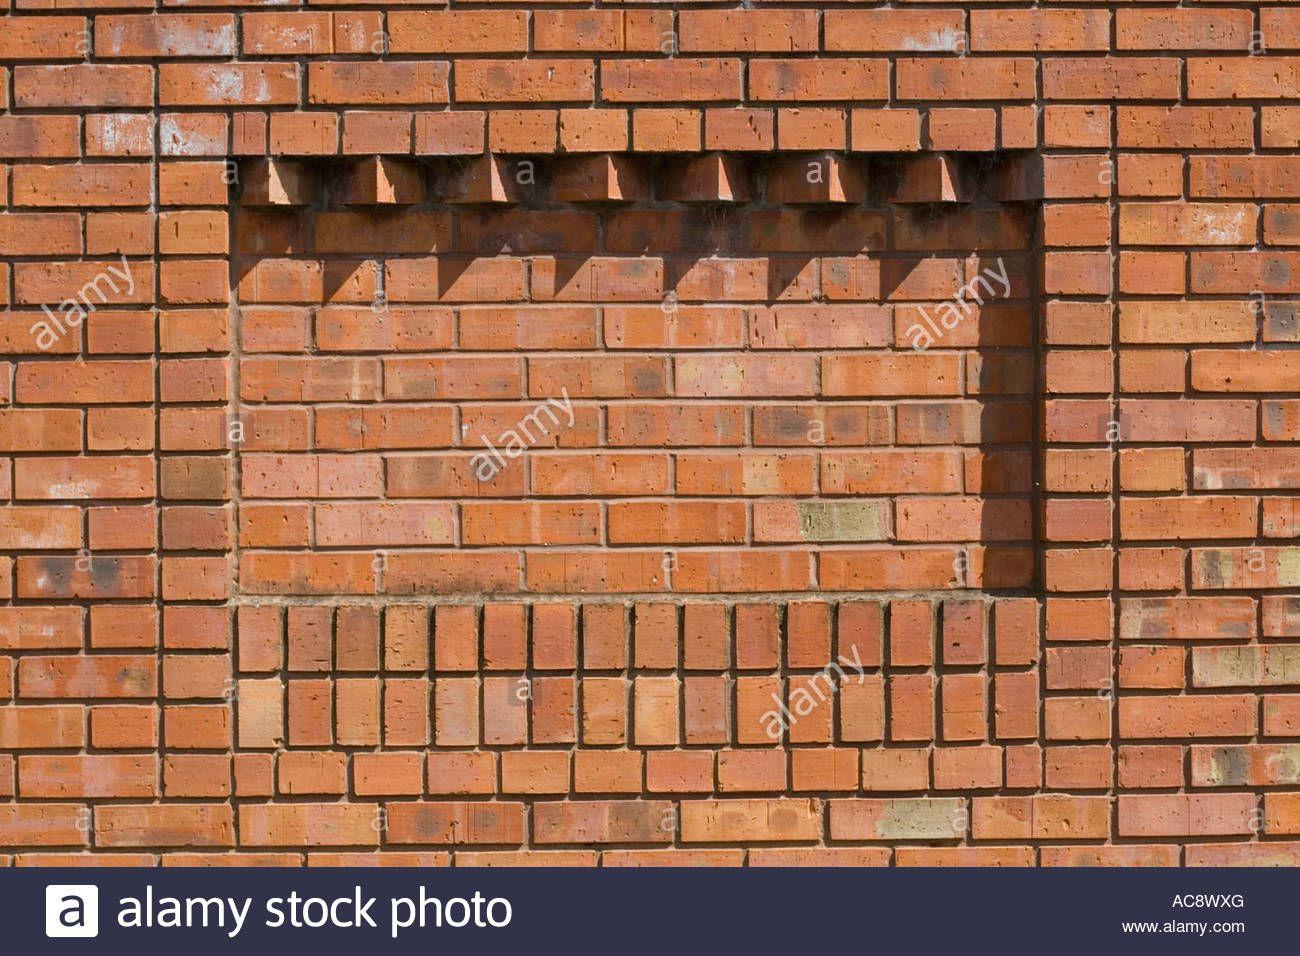 Corbelling In Brickwork Providing Relief Pattern On Red Brick Wall Ac8wxg Jpg 1300 956 Red Brick Walls Corbels Brick Wall